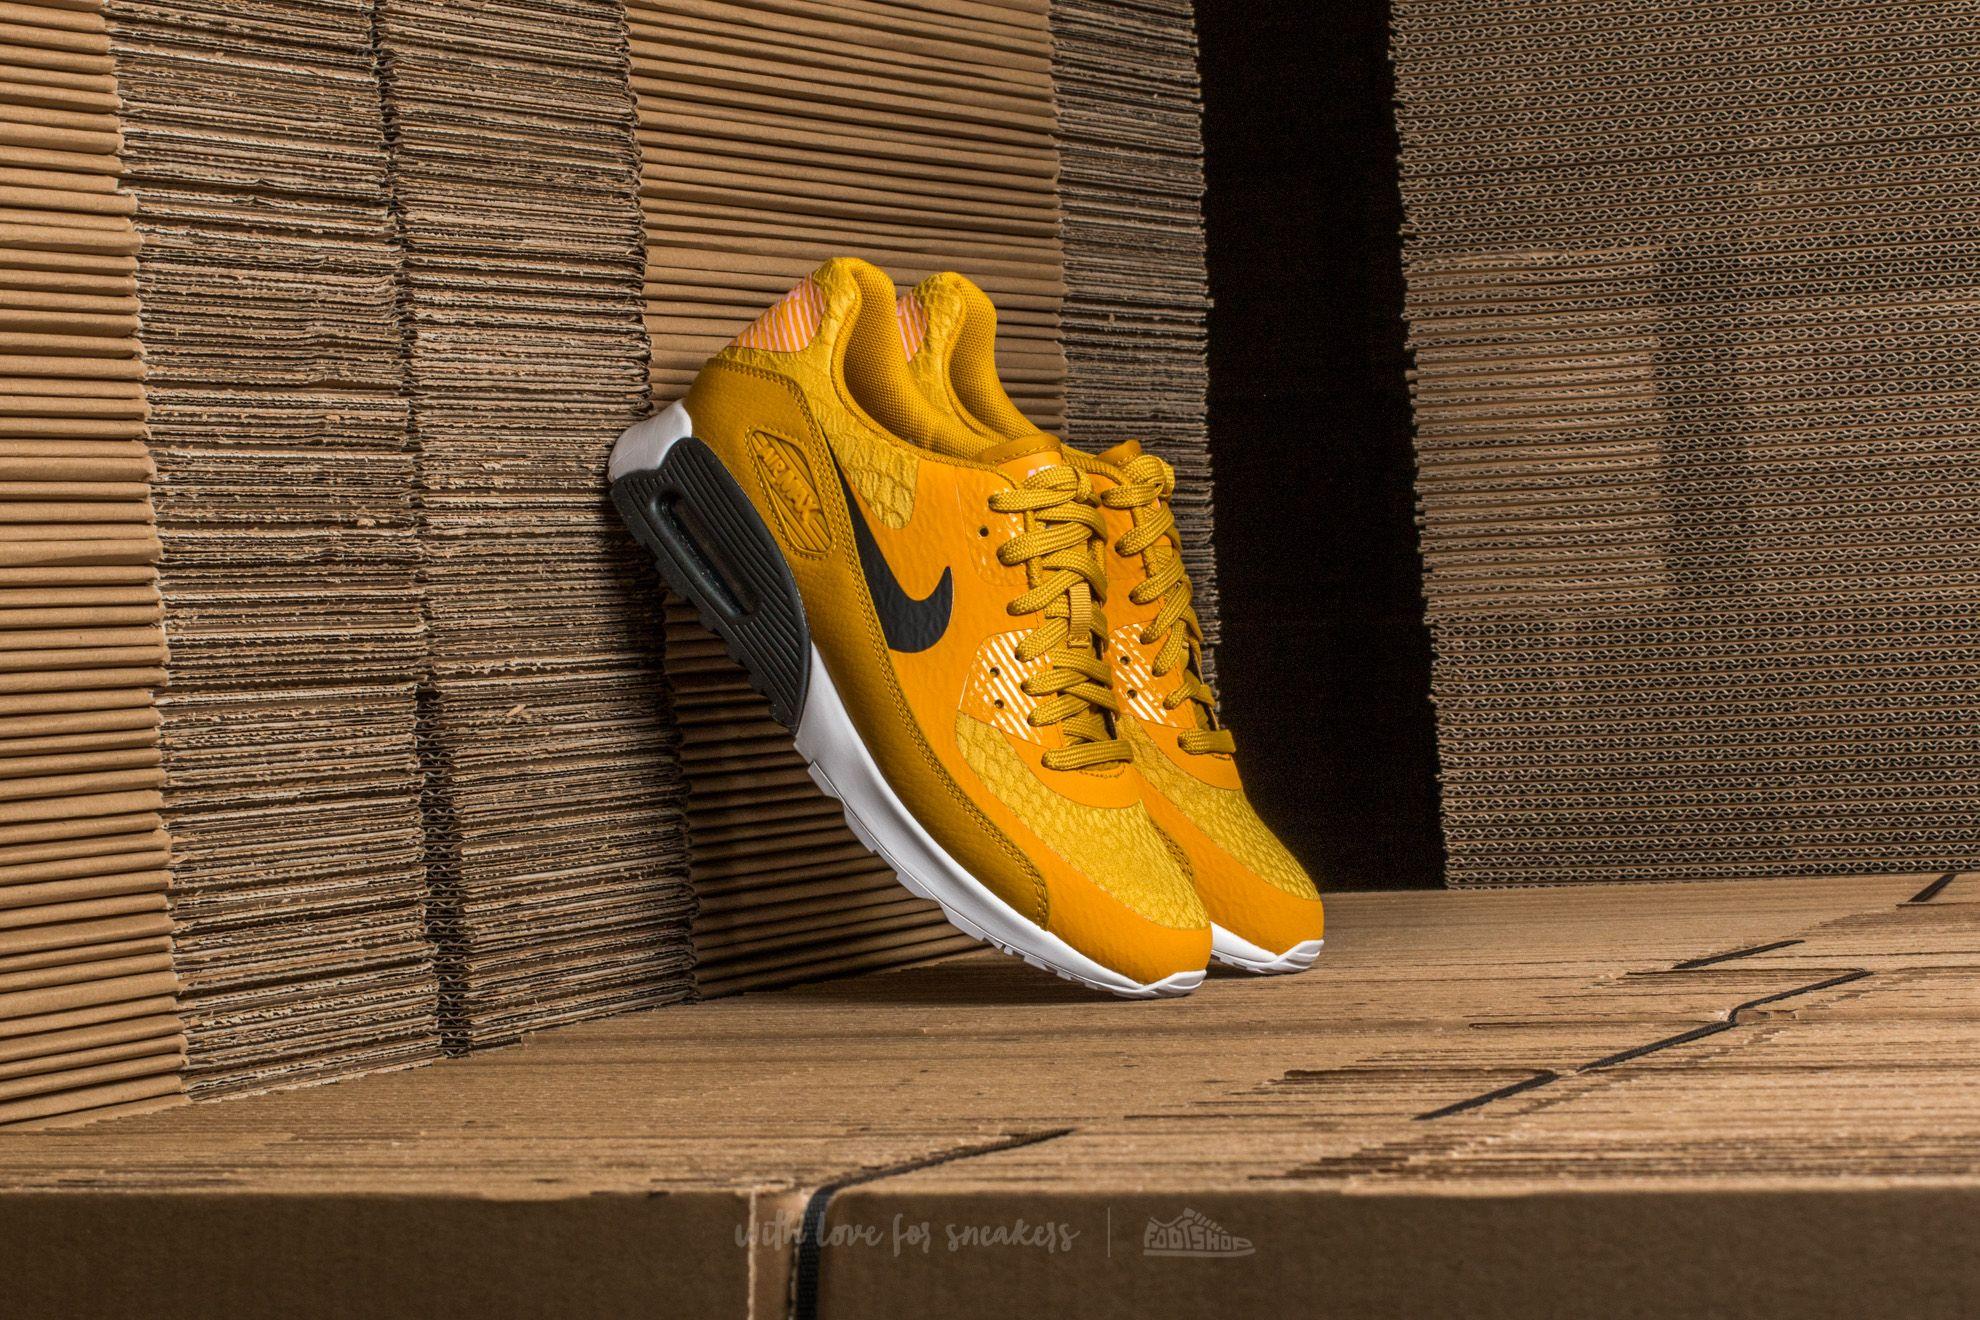 Gold Max 90 Dart 2 Nike WhiteFootshop Black Air Ultra W 0 tQohdBsCrx